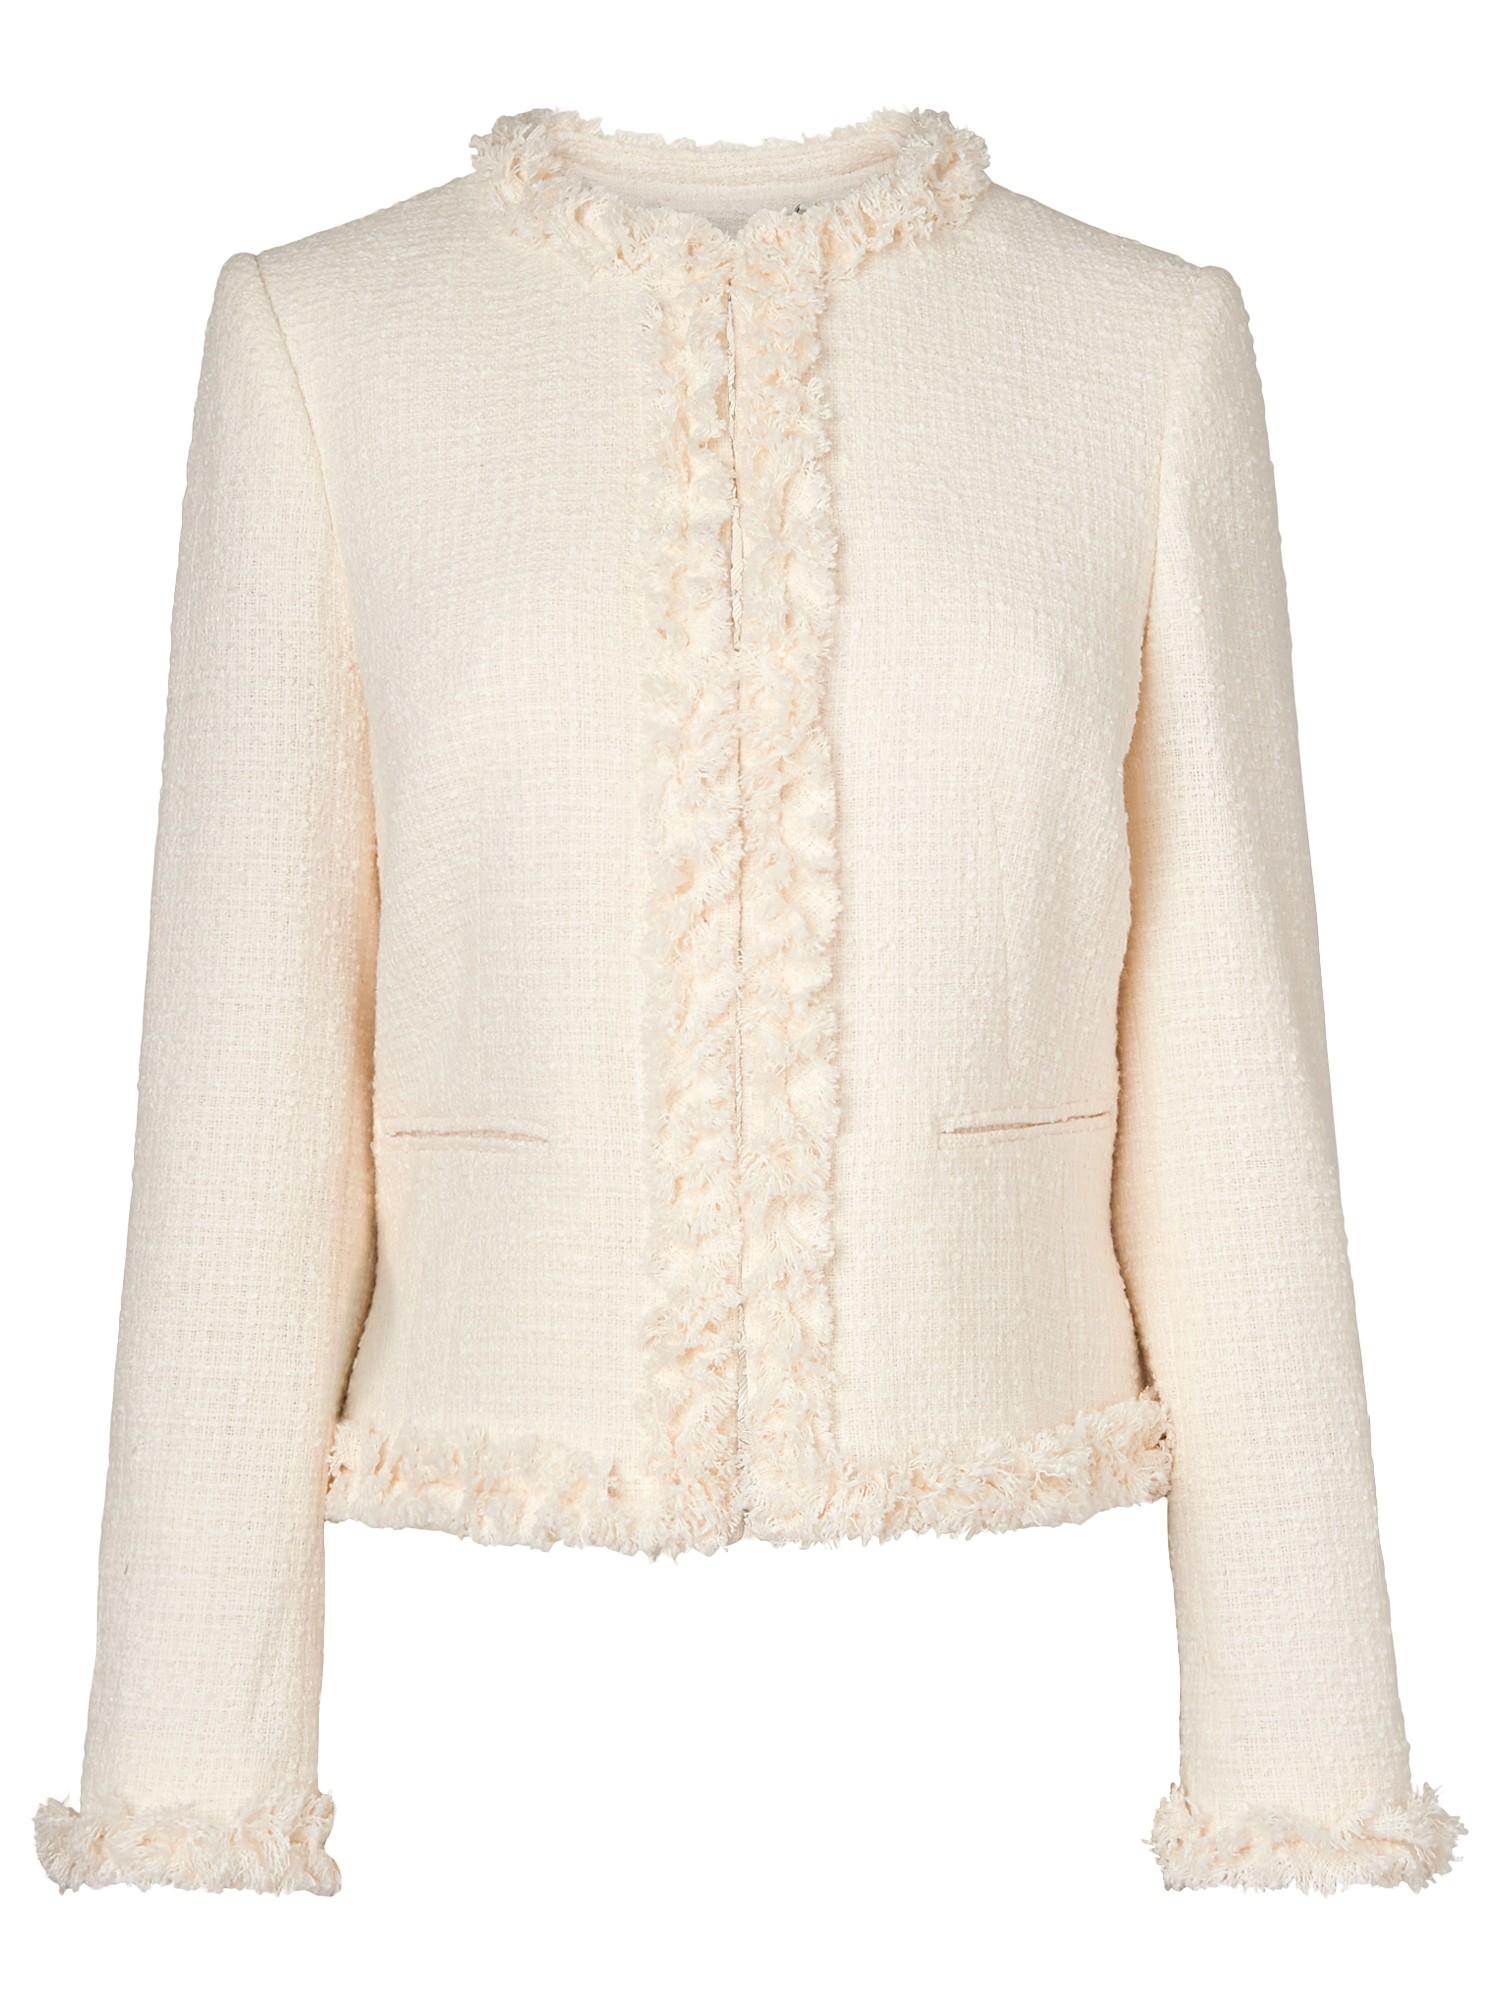 L.k.bennett Malena Tweed Jacket in Natural | Lyst